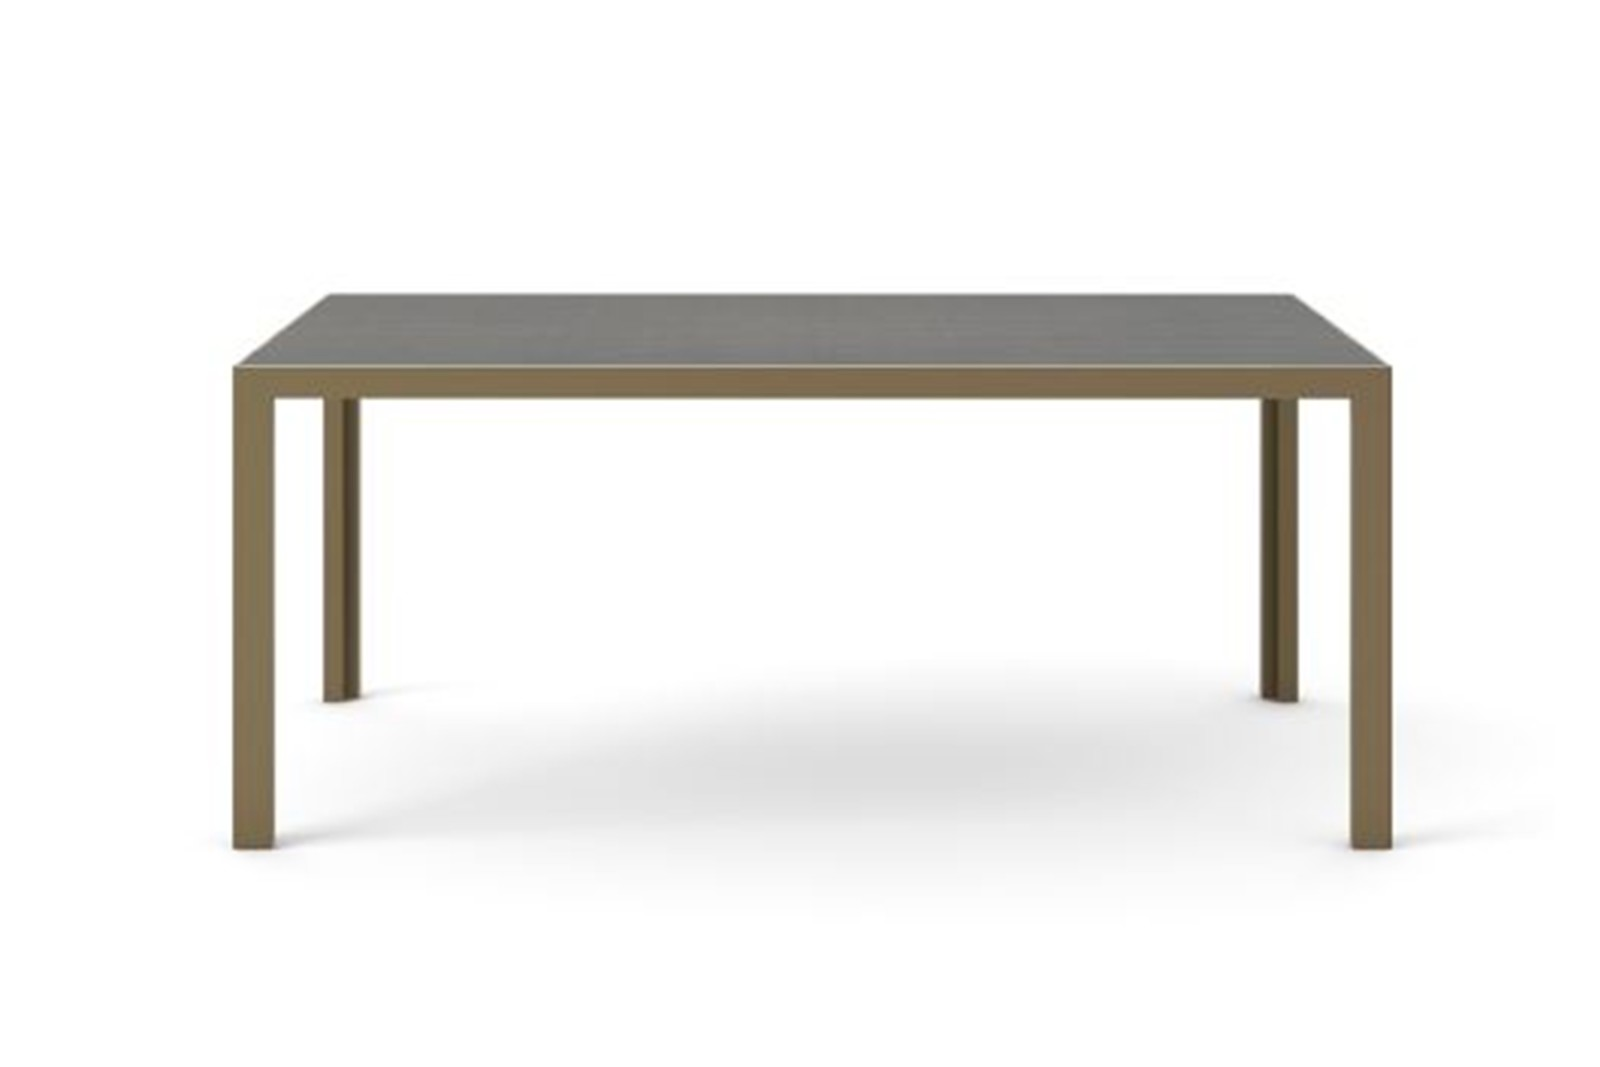 Dénia Dining Table, Rectangular Bronze Anodised Aluminium, Dark Grey Stained Oak, 200